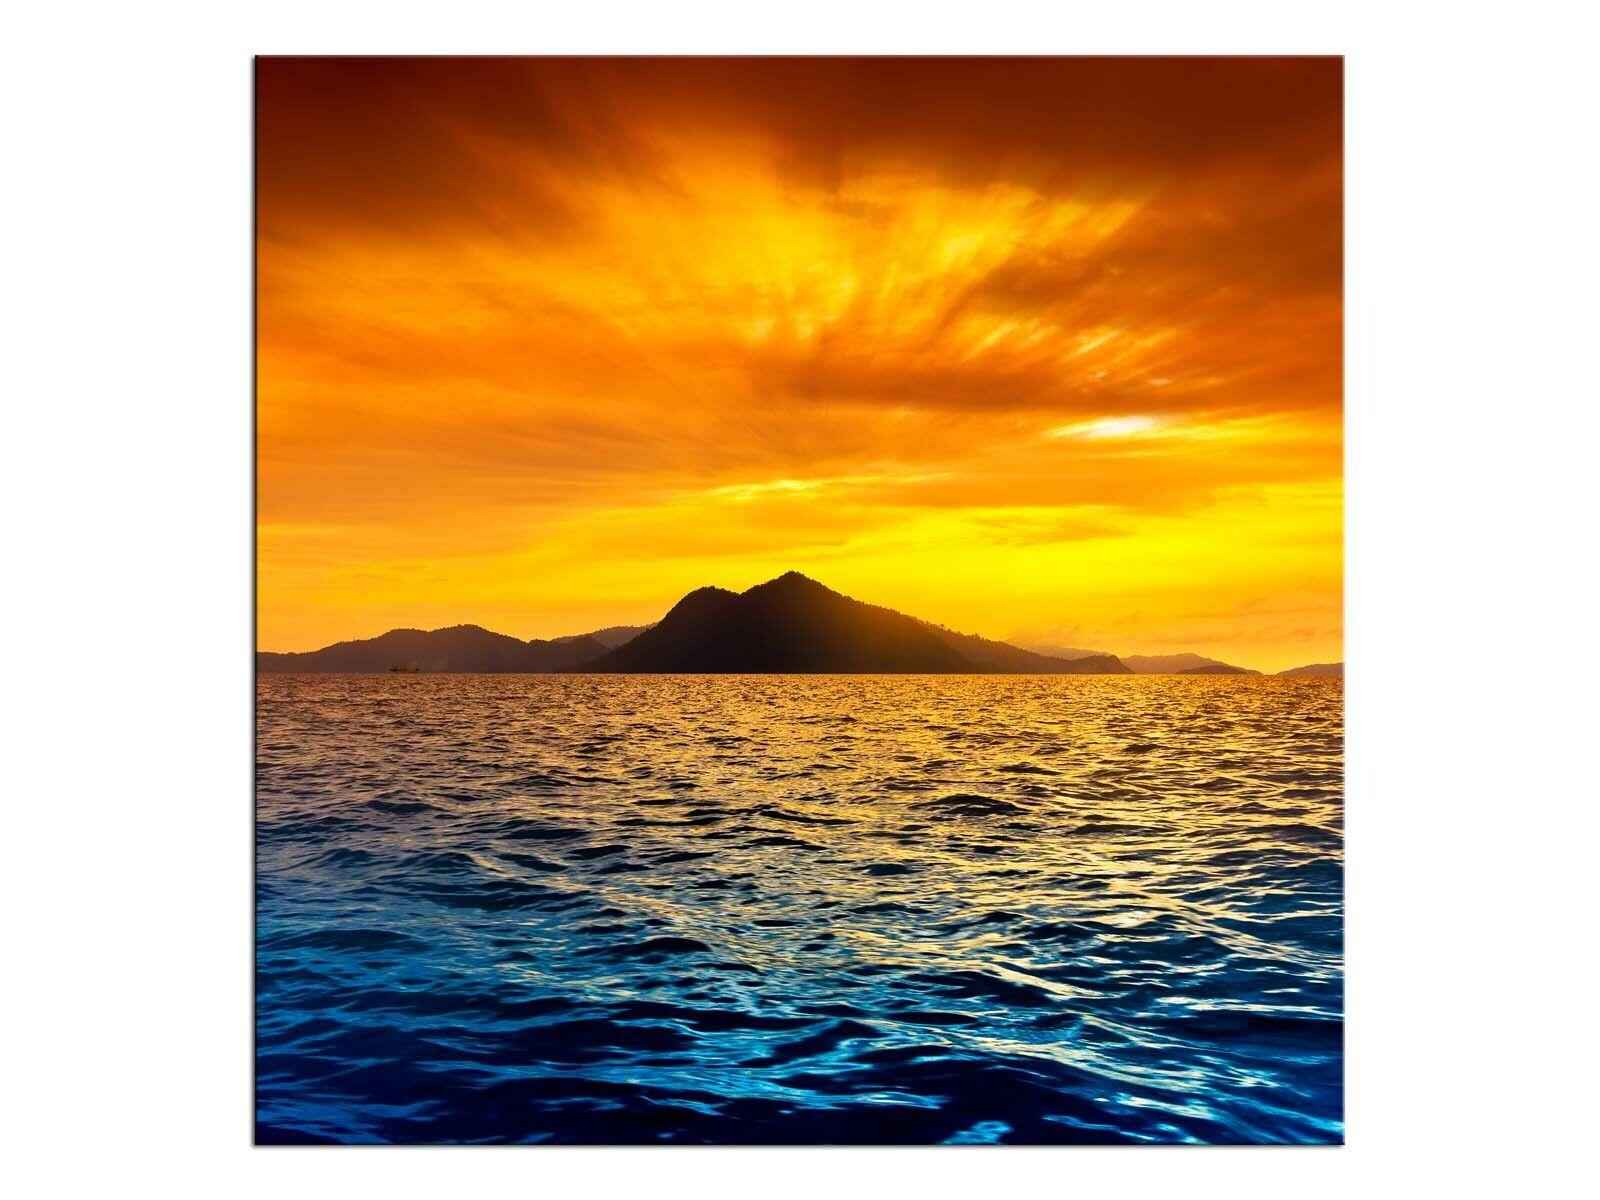 Abendrot Insel Wandbild A06144 Canvas Leinwandbild quadratisch auf Keilrahmen